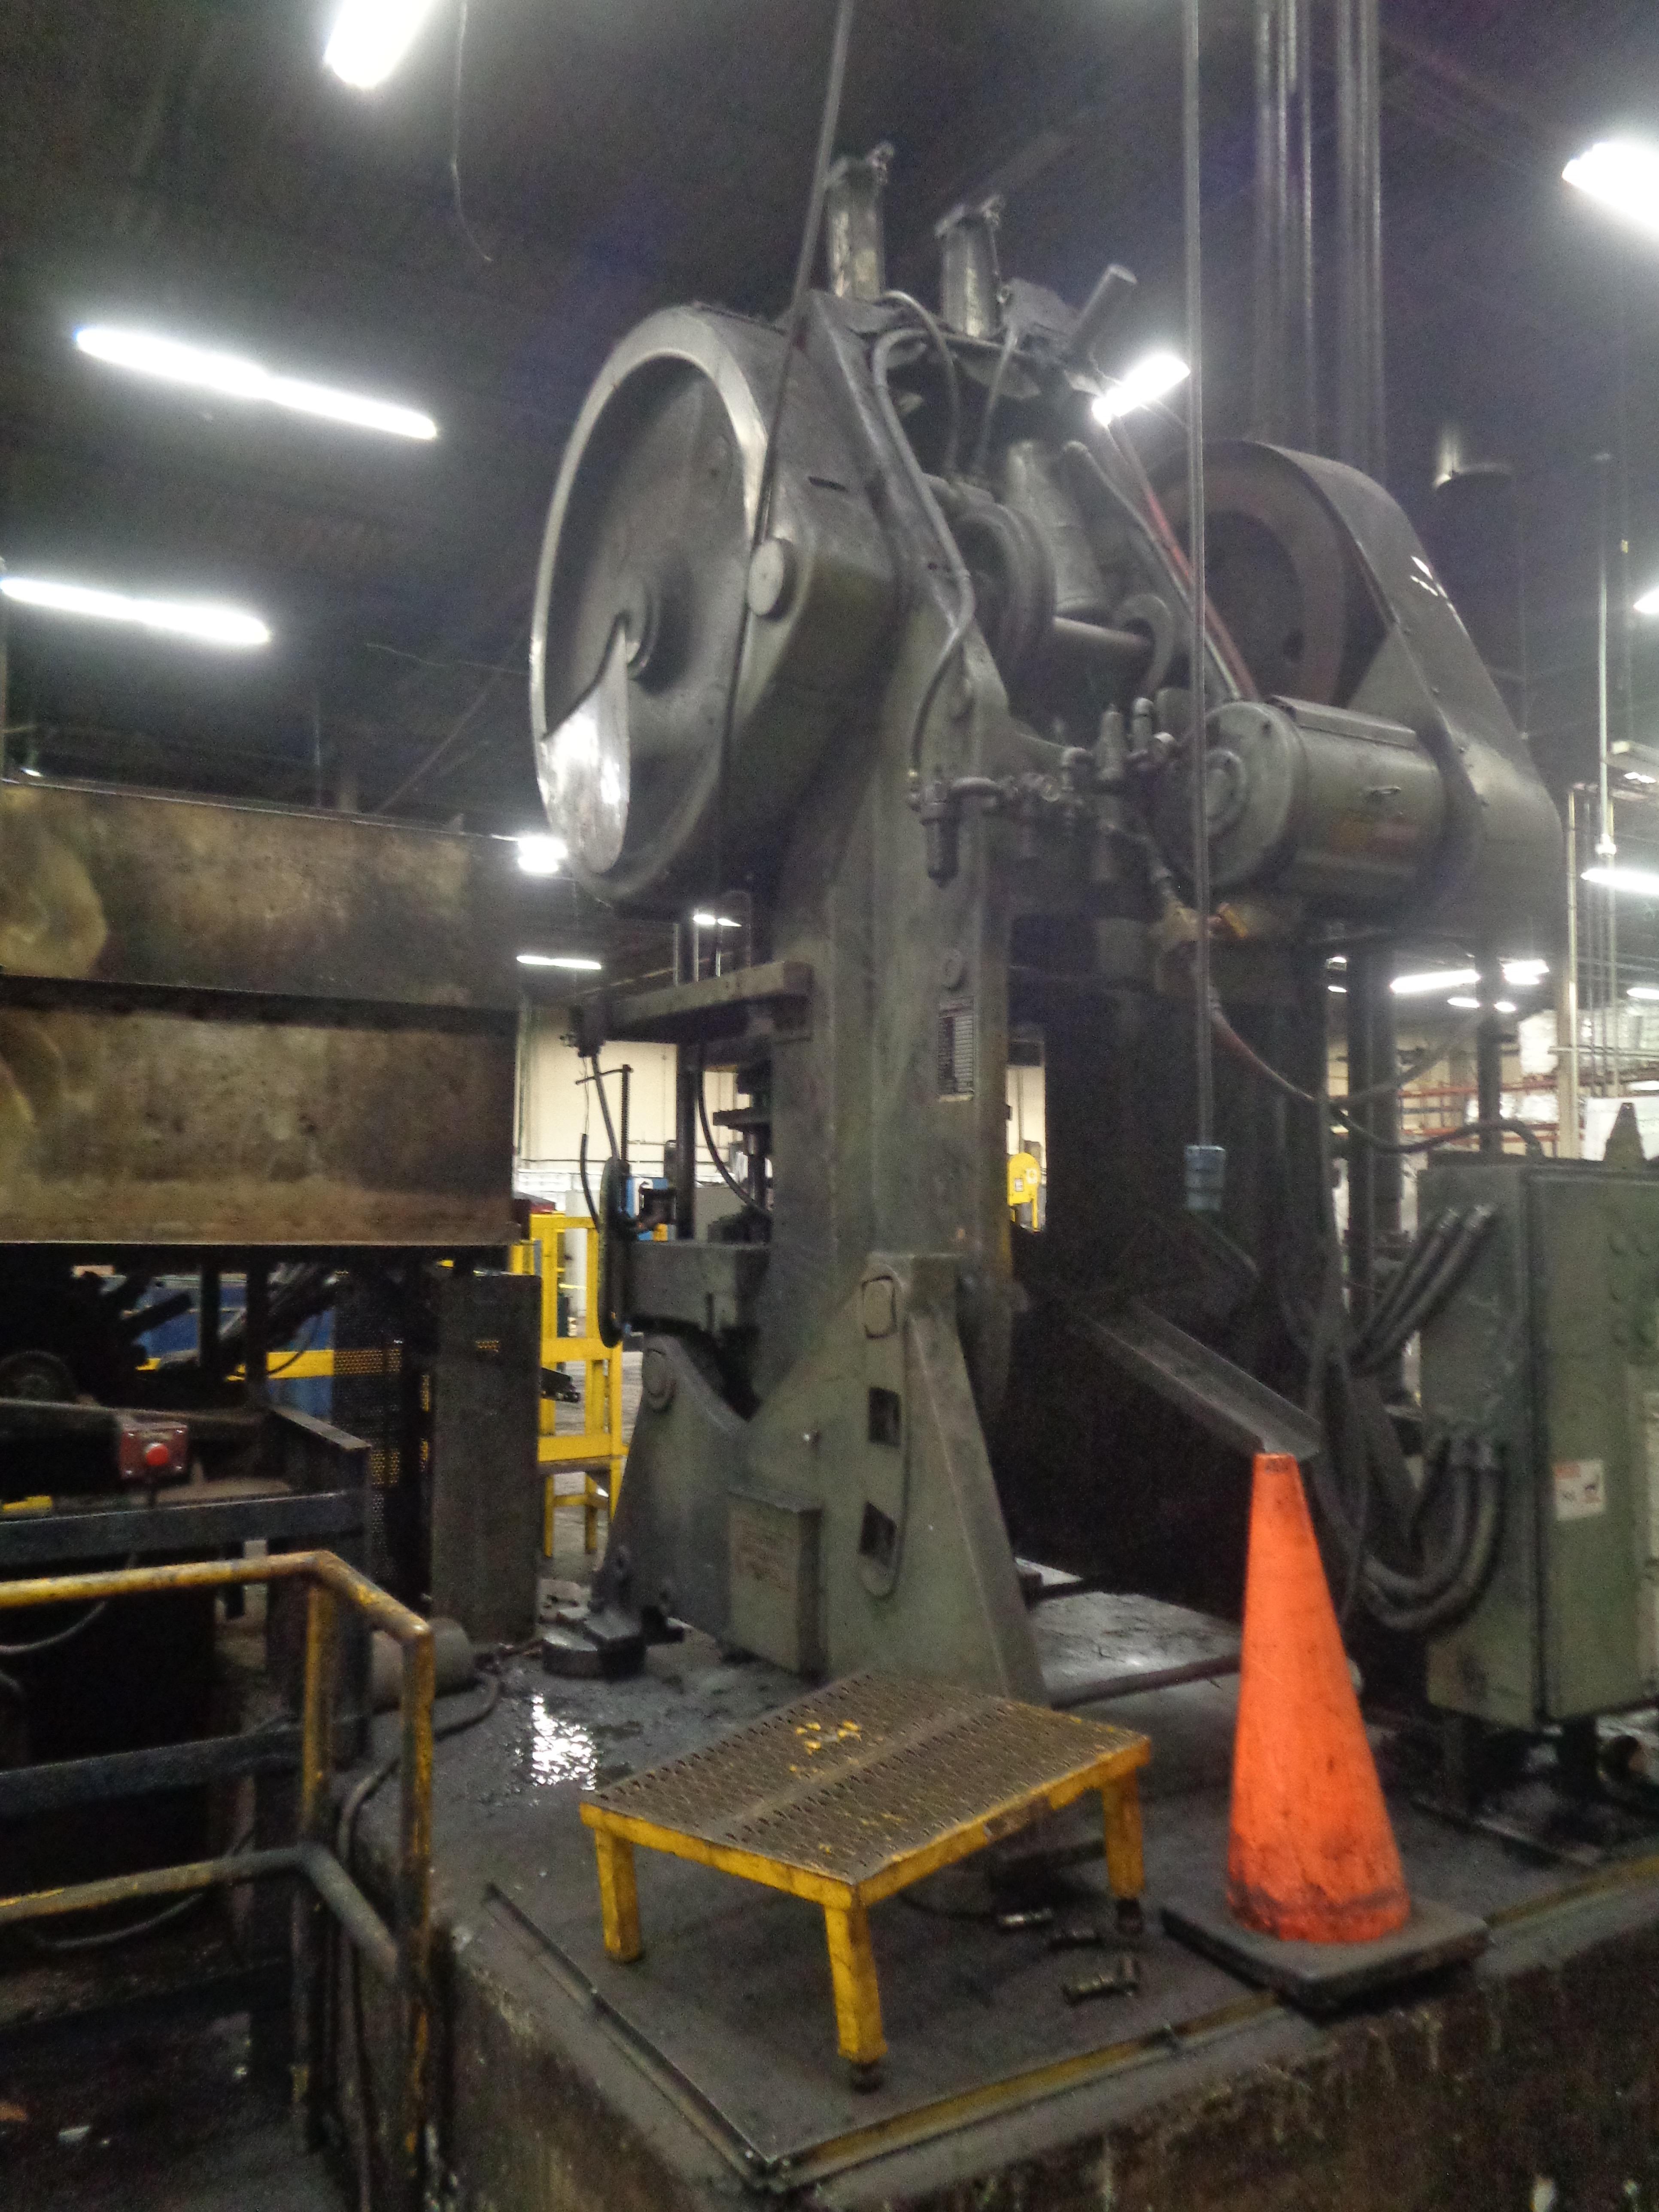 South Bend Press 125 Ton Located in Swedsboro NJ - Image 3 of 6